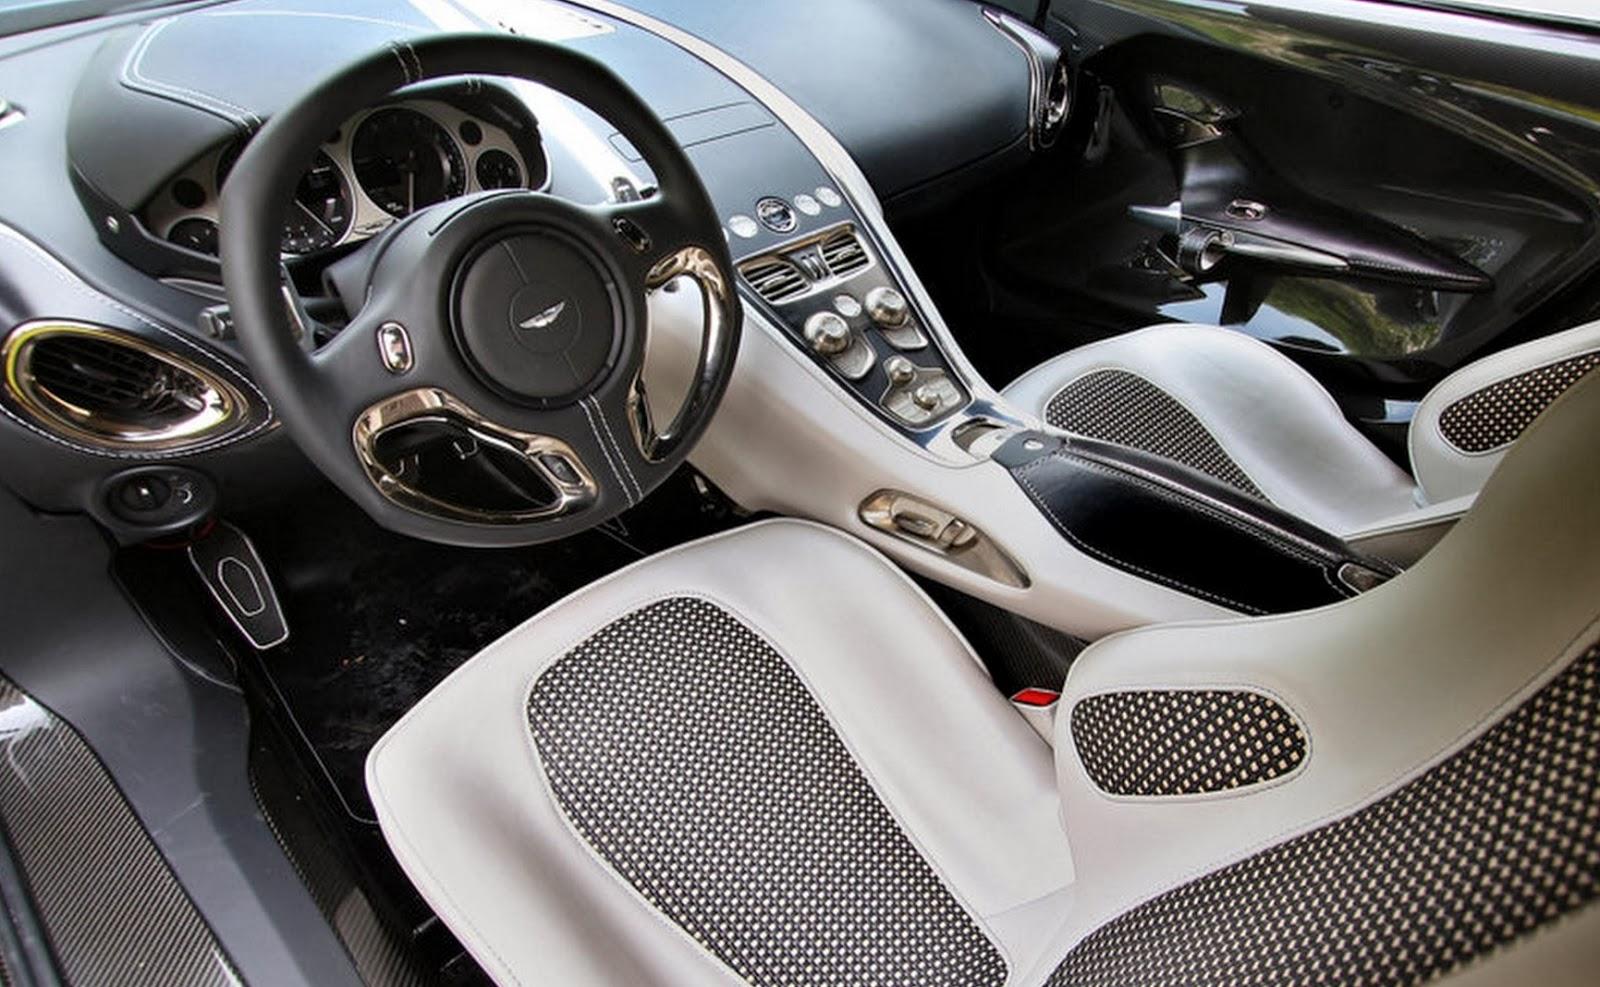 Aston Martin One-77 Wallpaper